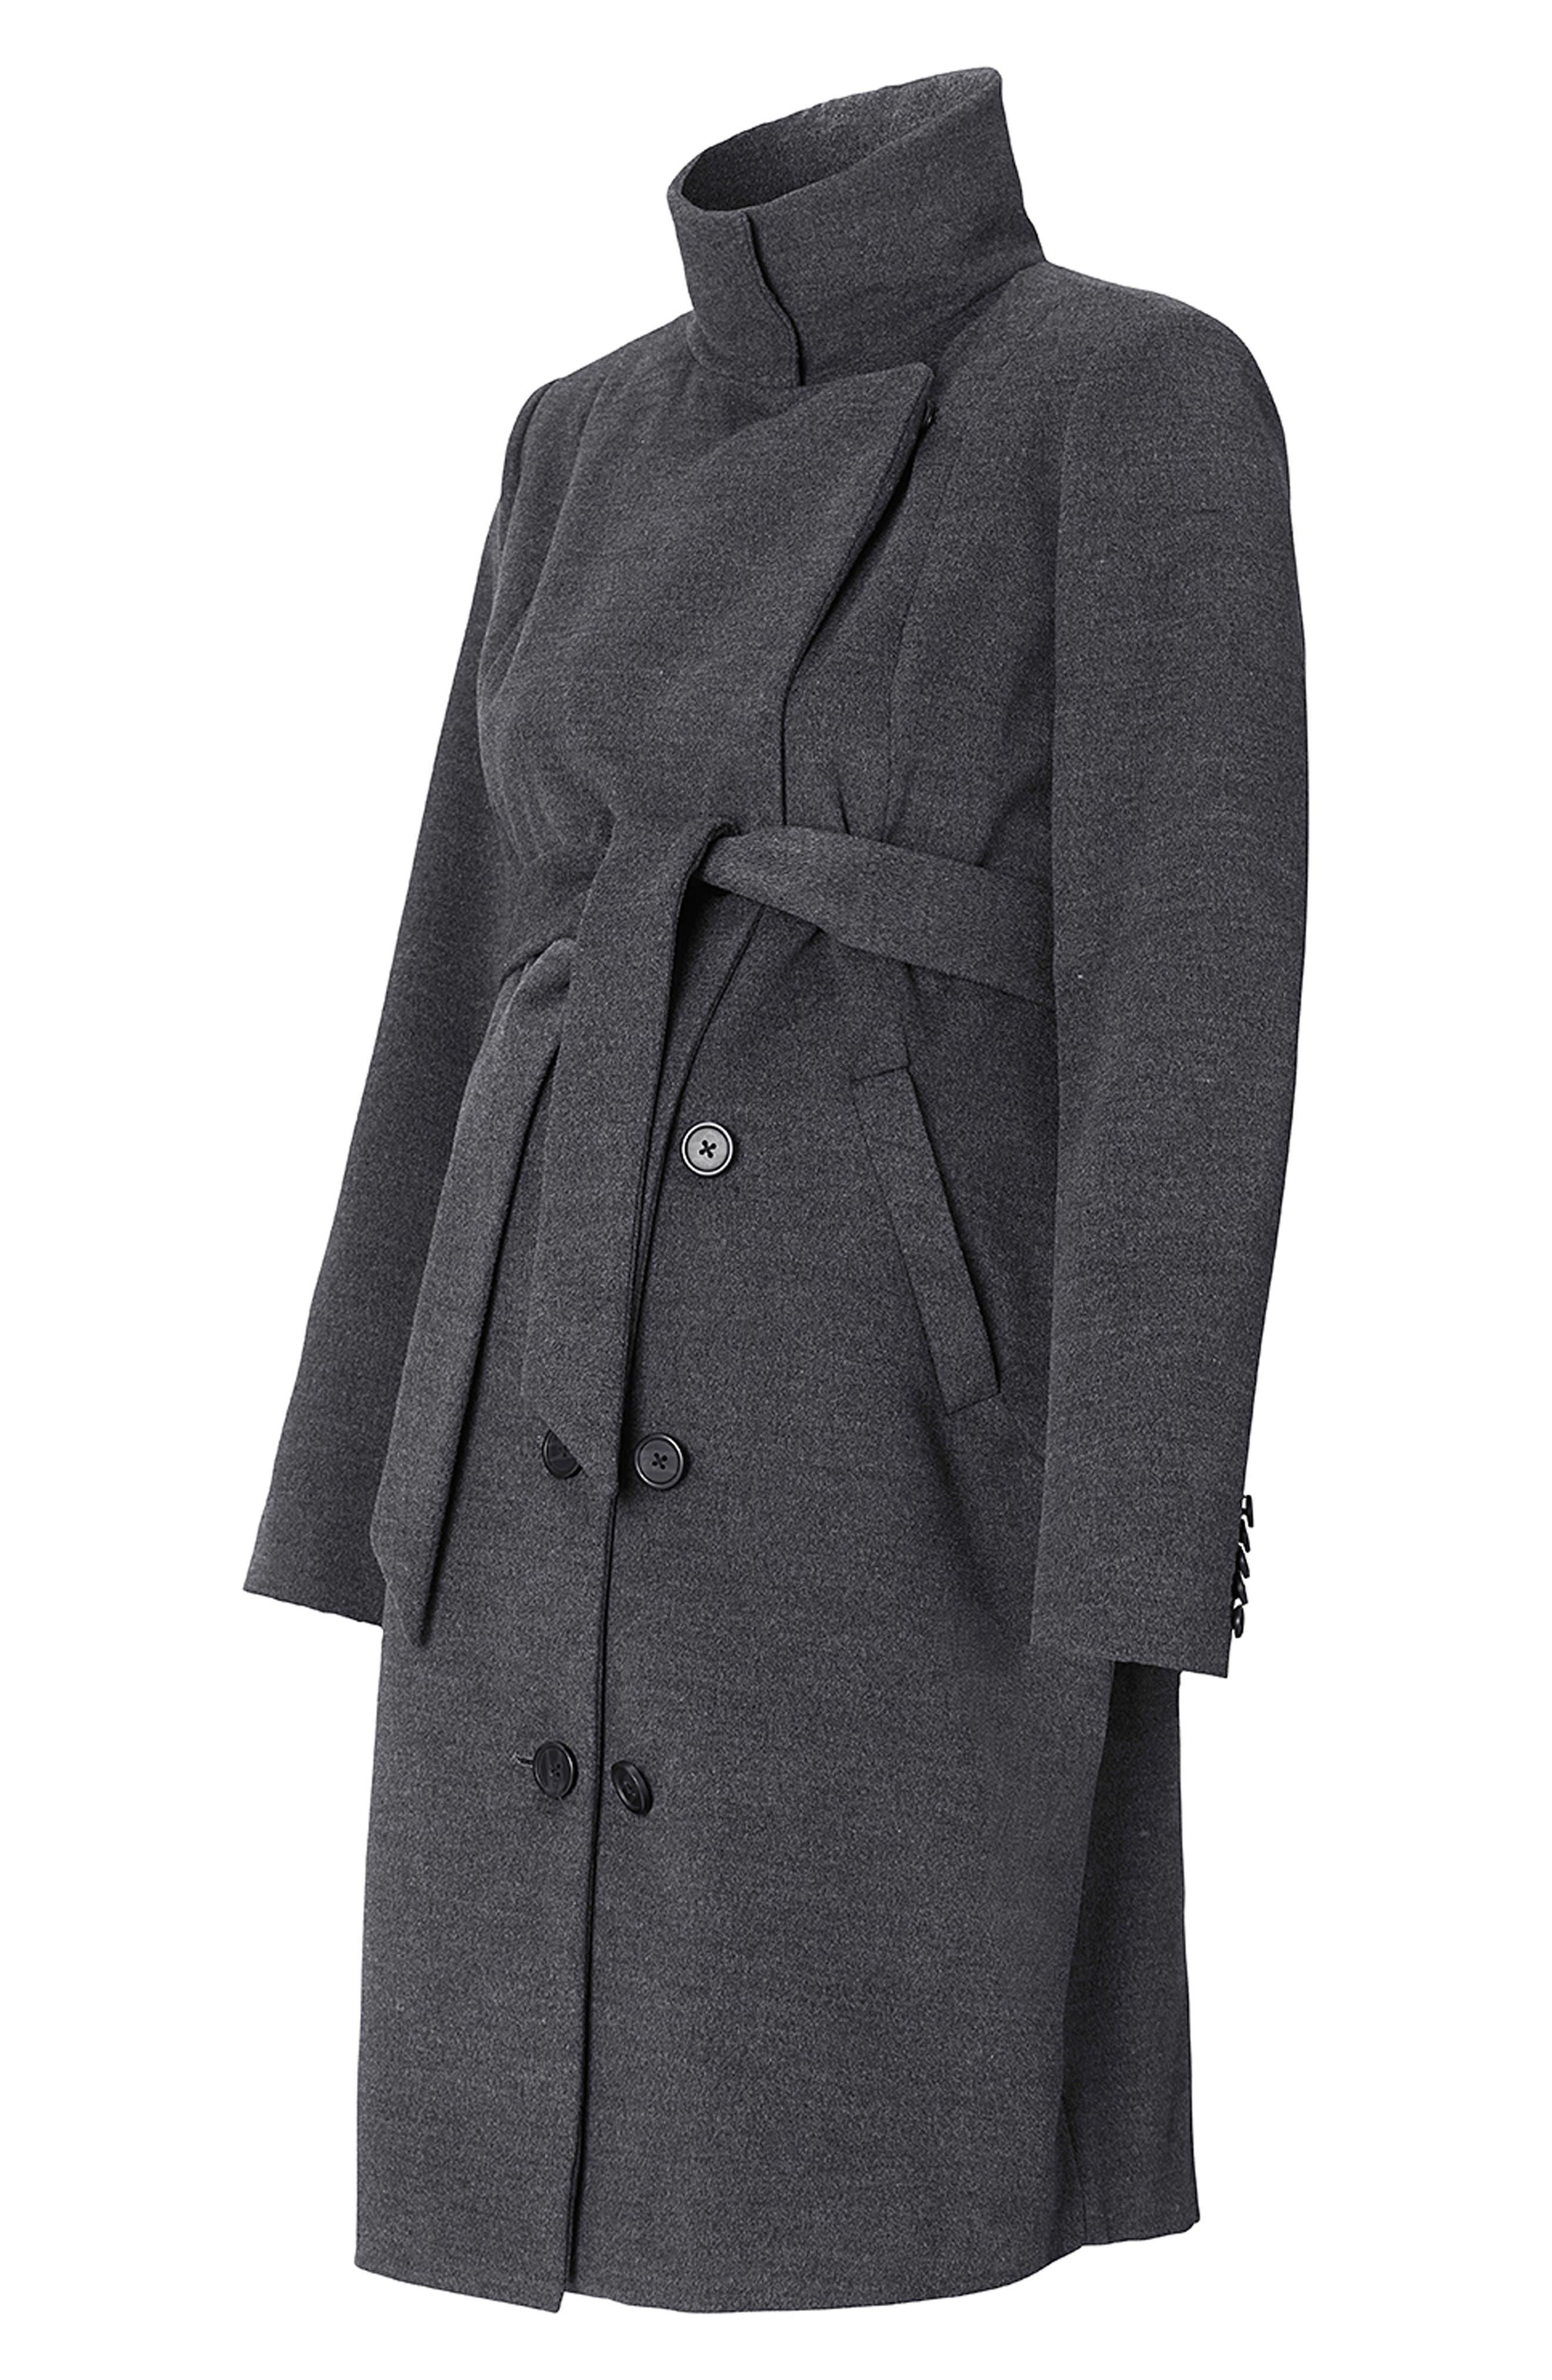 Ilena 2 Maternity Coat,                             Alternate thumbnail 3, color,                             BLACK MELANGE